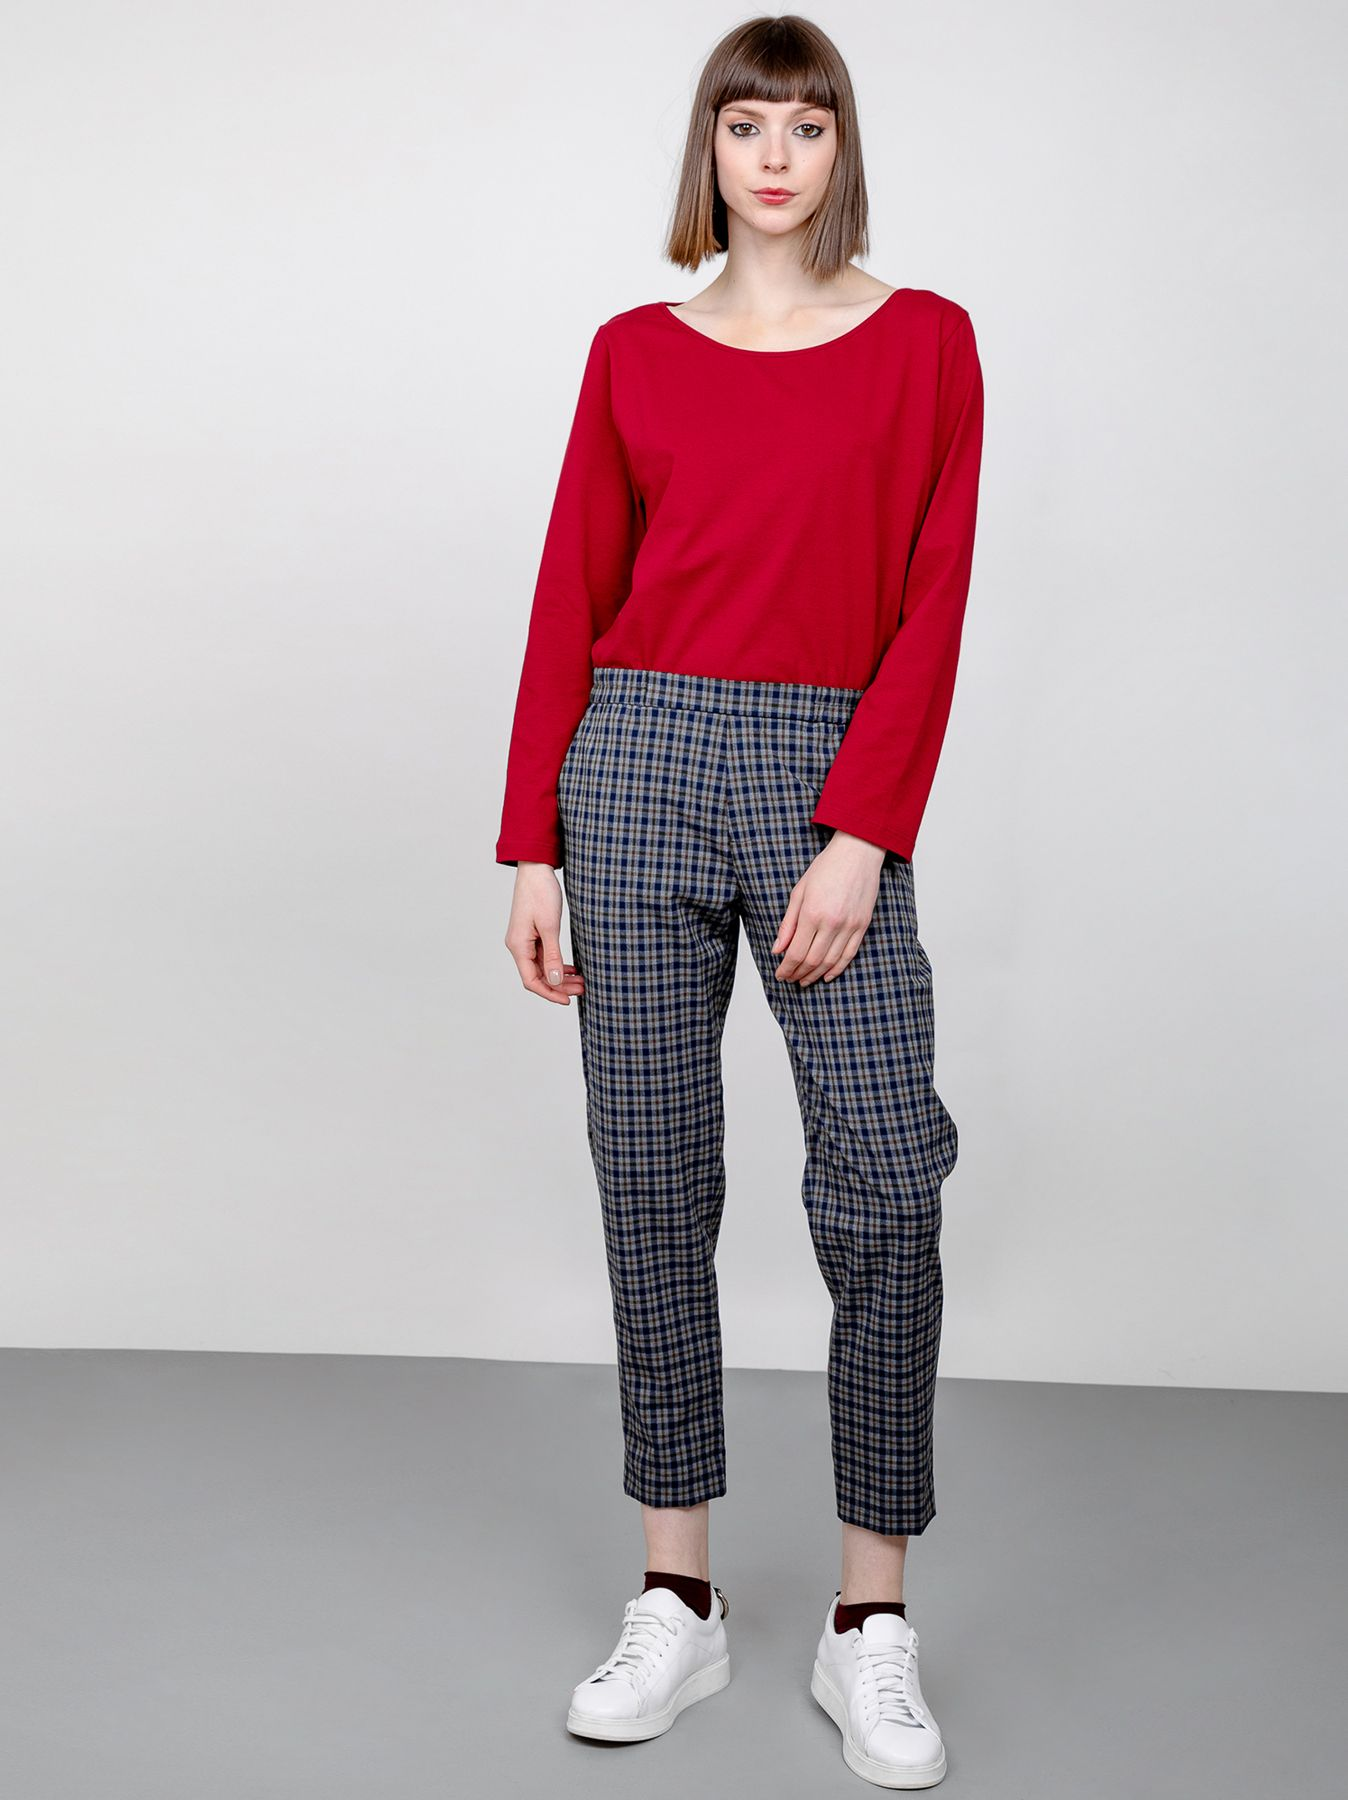 Pantalone chino in tessuto check